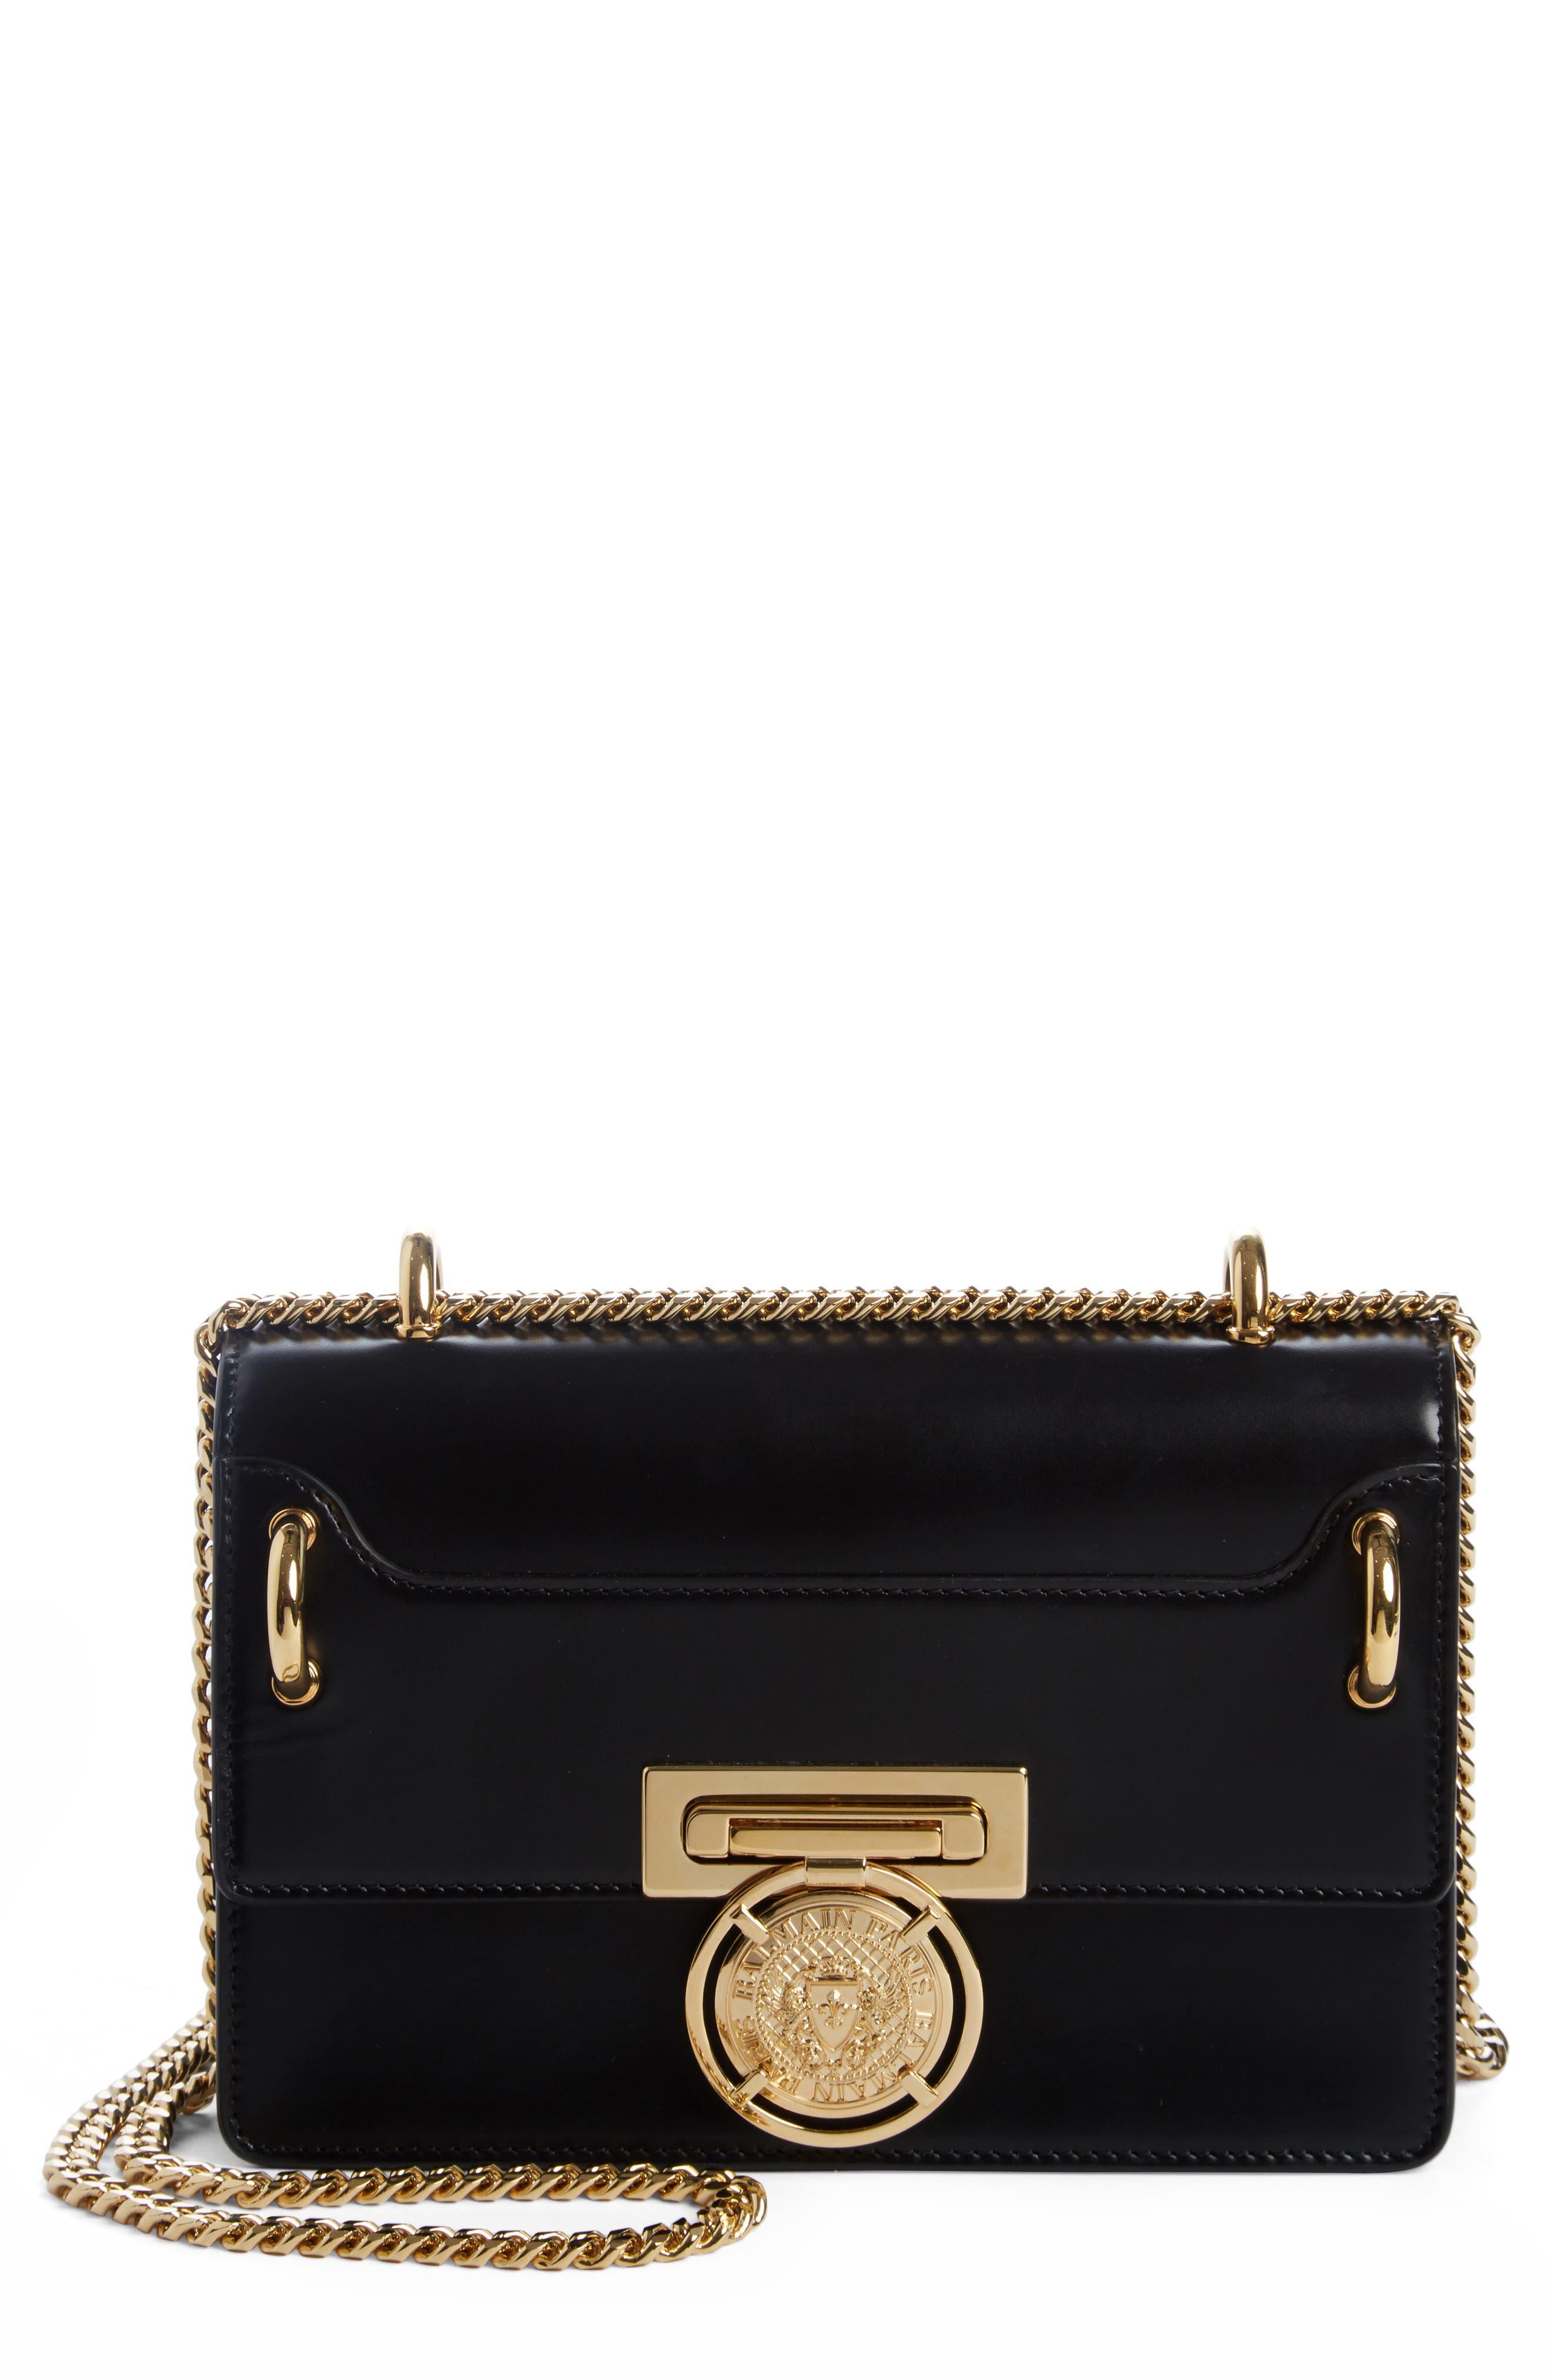 Alternate Image 1 Selected - Balmain Glace Leather Box Shoulder Bag